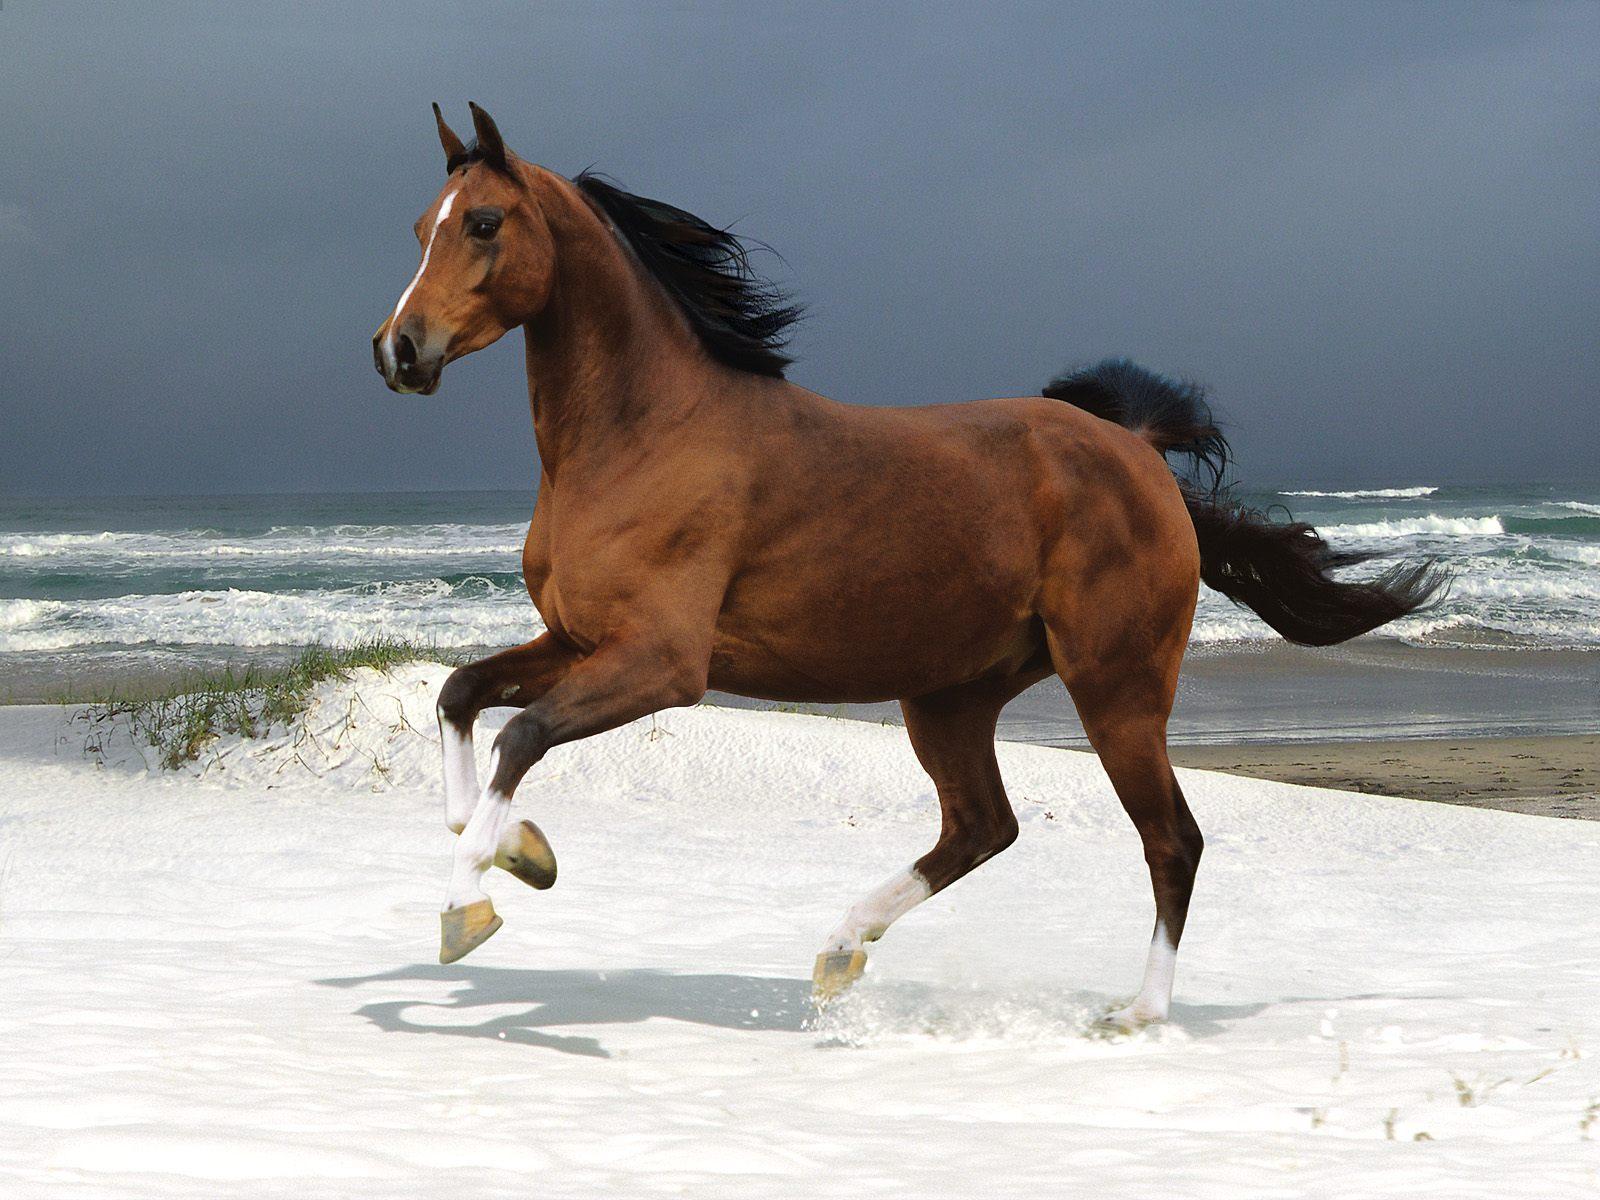 Animals brown horses ocean running wallpaper HQ WALLPAPER - (#172820)